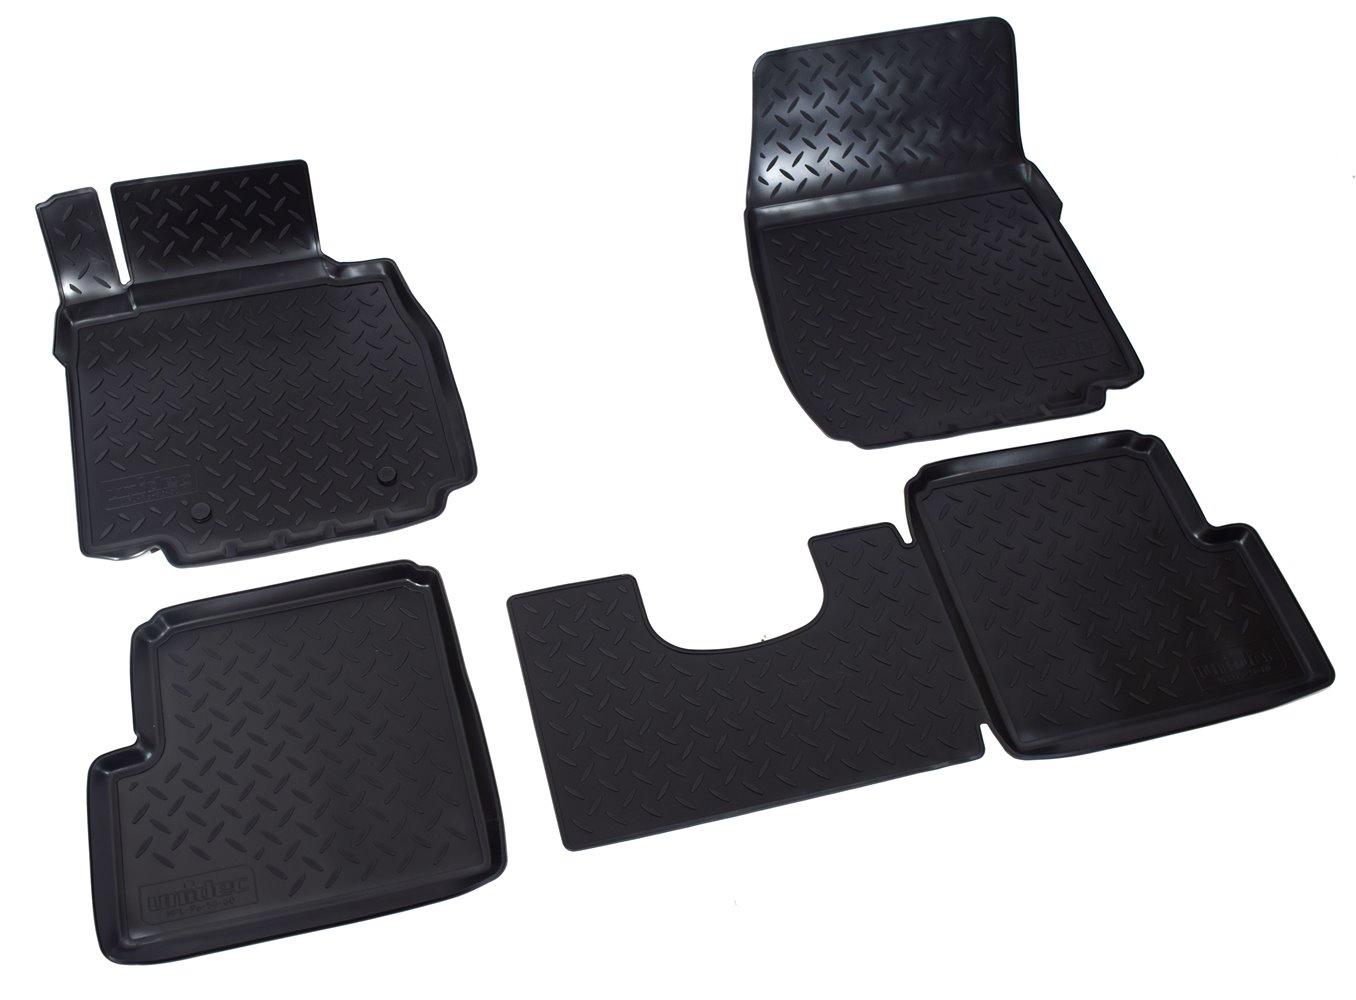 Коврики в салон автомобиля Norplast для Mercedes-Benz G (W463) (1990), NPL-Po-56-60, черный g